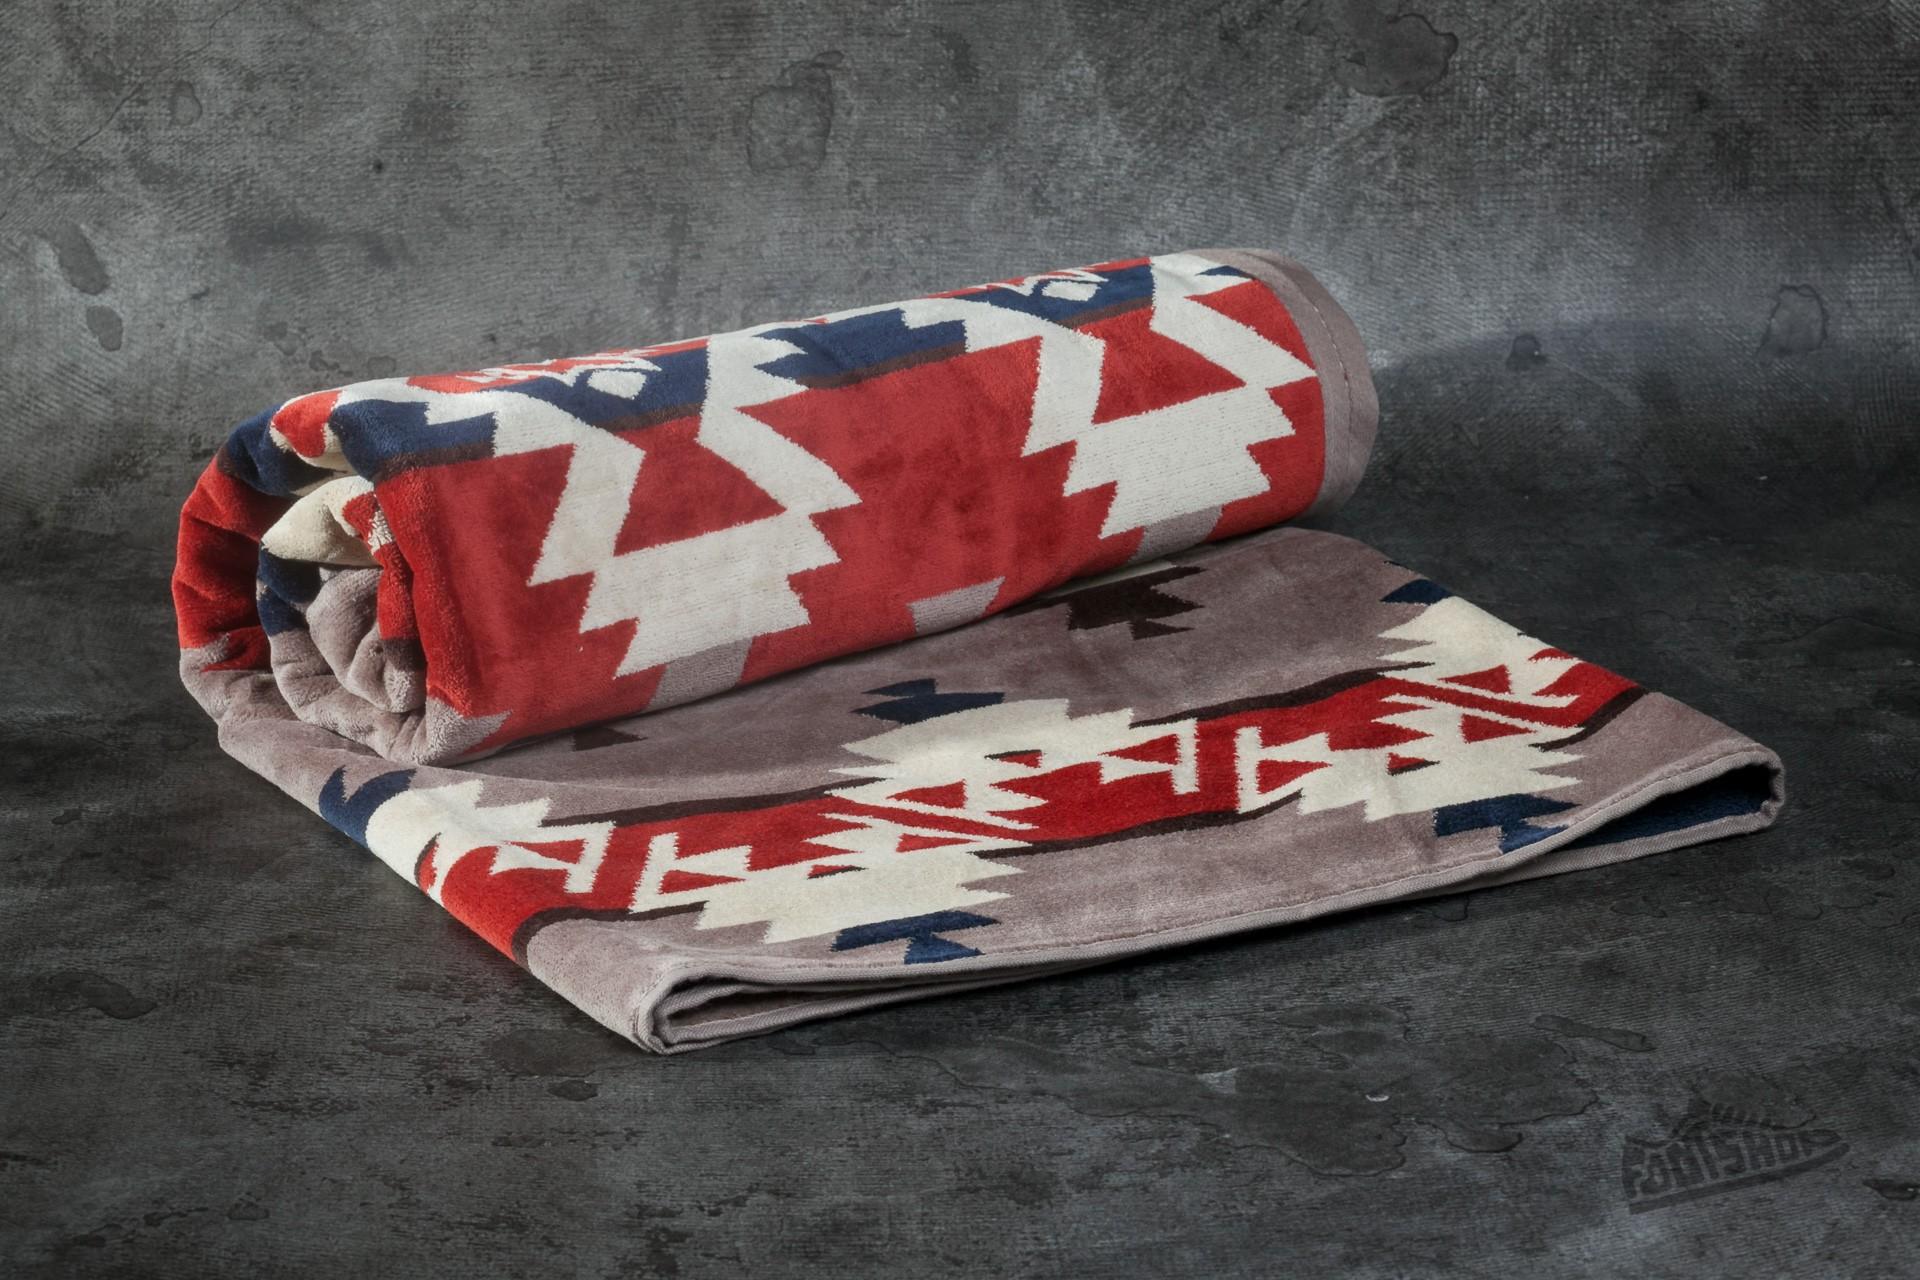 Pendleton Mountain Majesty Jacquard Beach Towel Fawn za skvelú cenu 77 € kúpite na Footshop.sk